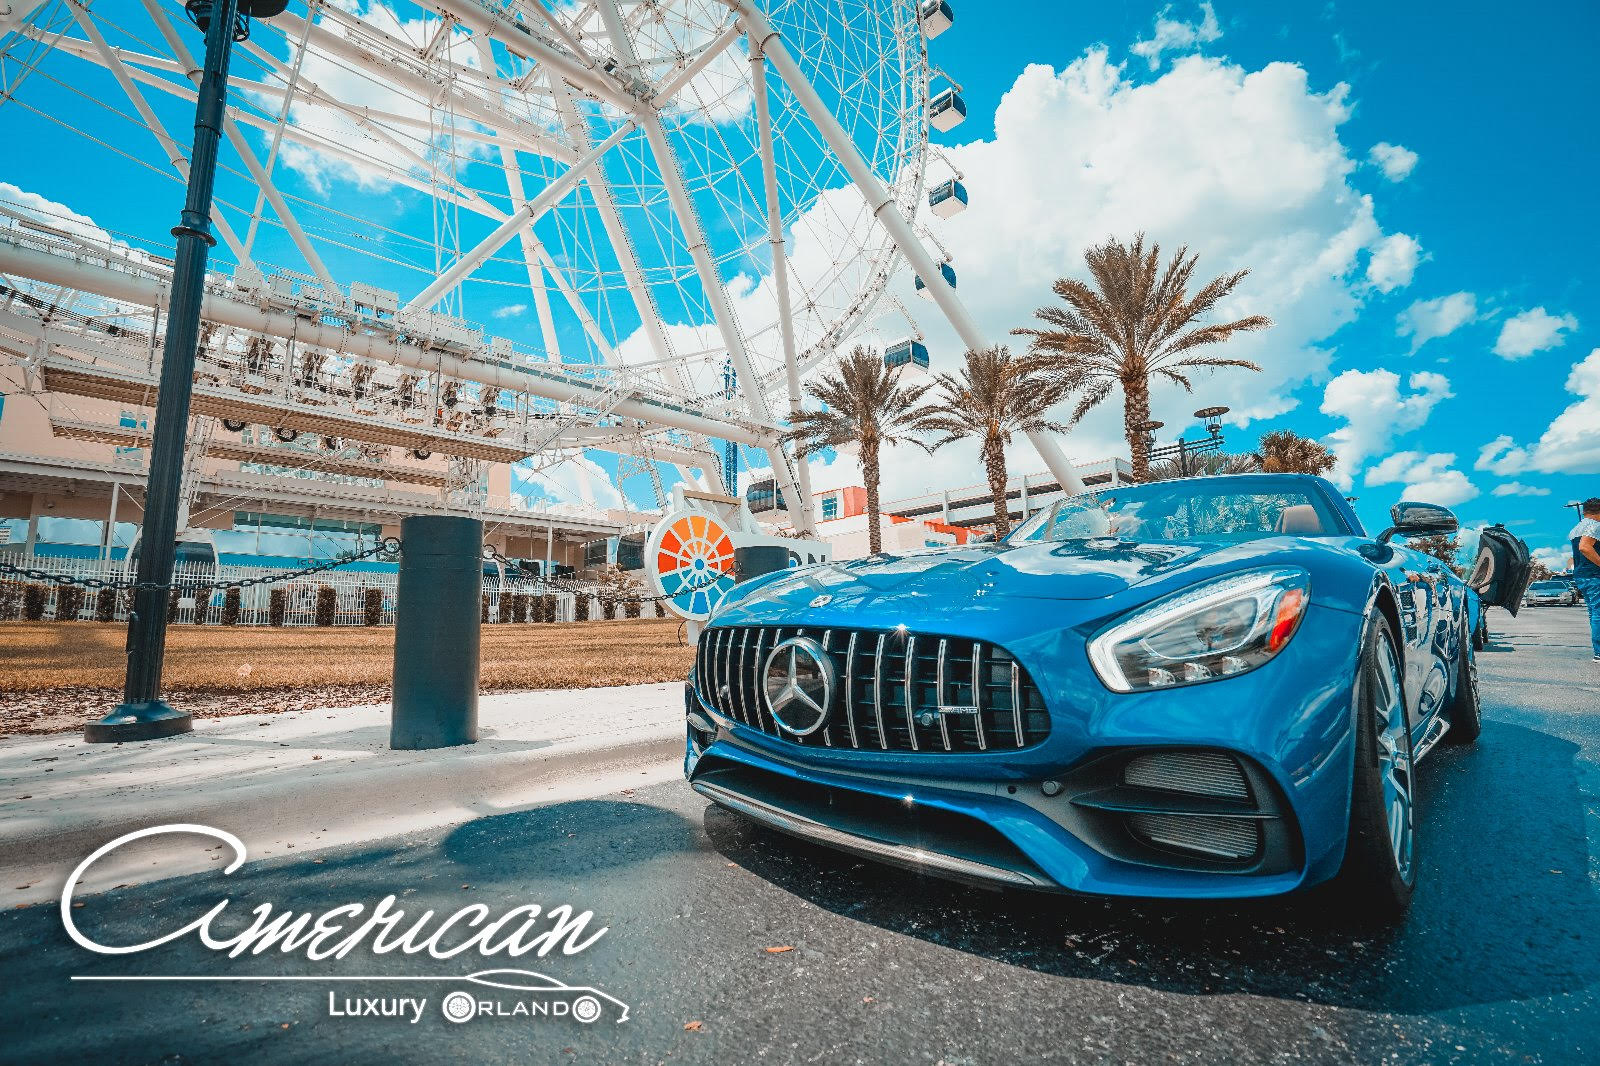 Mercedes Benz Amg Gtc Rental In Orlando American Luxury